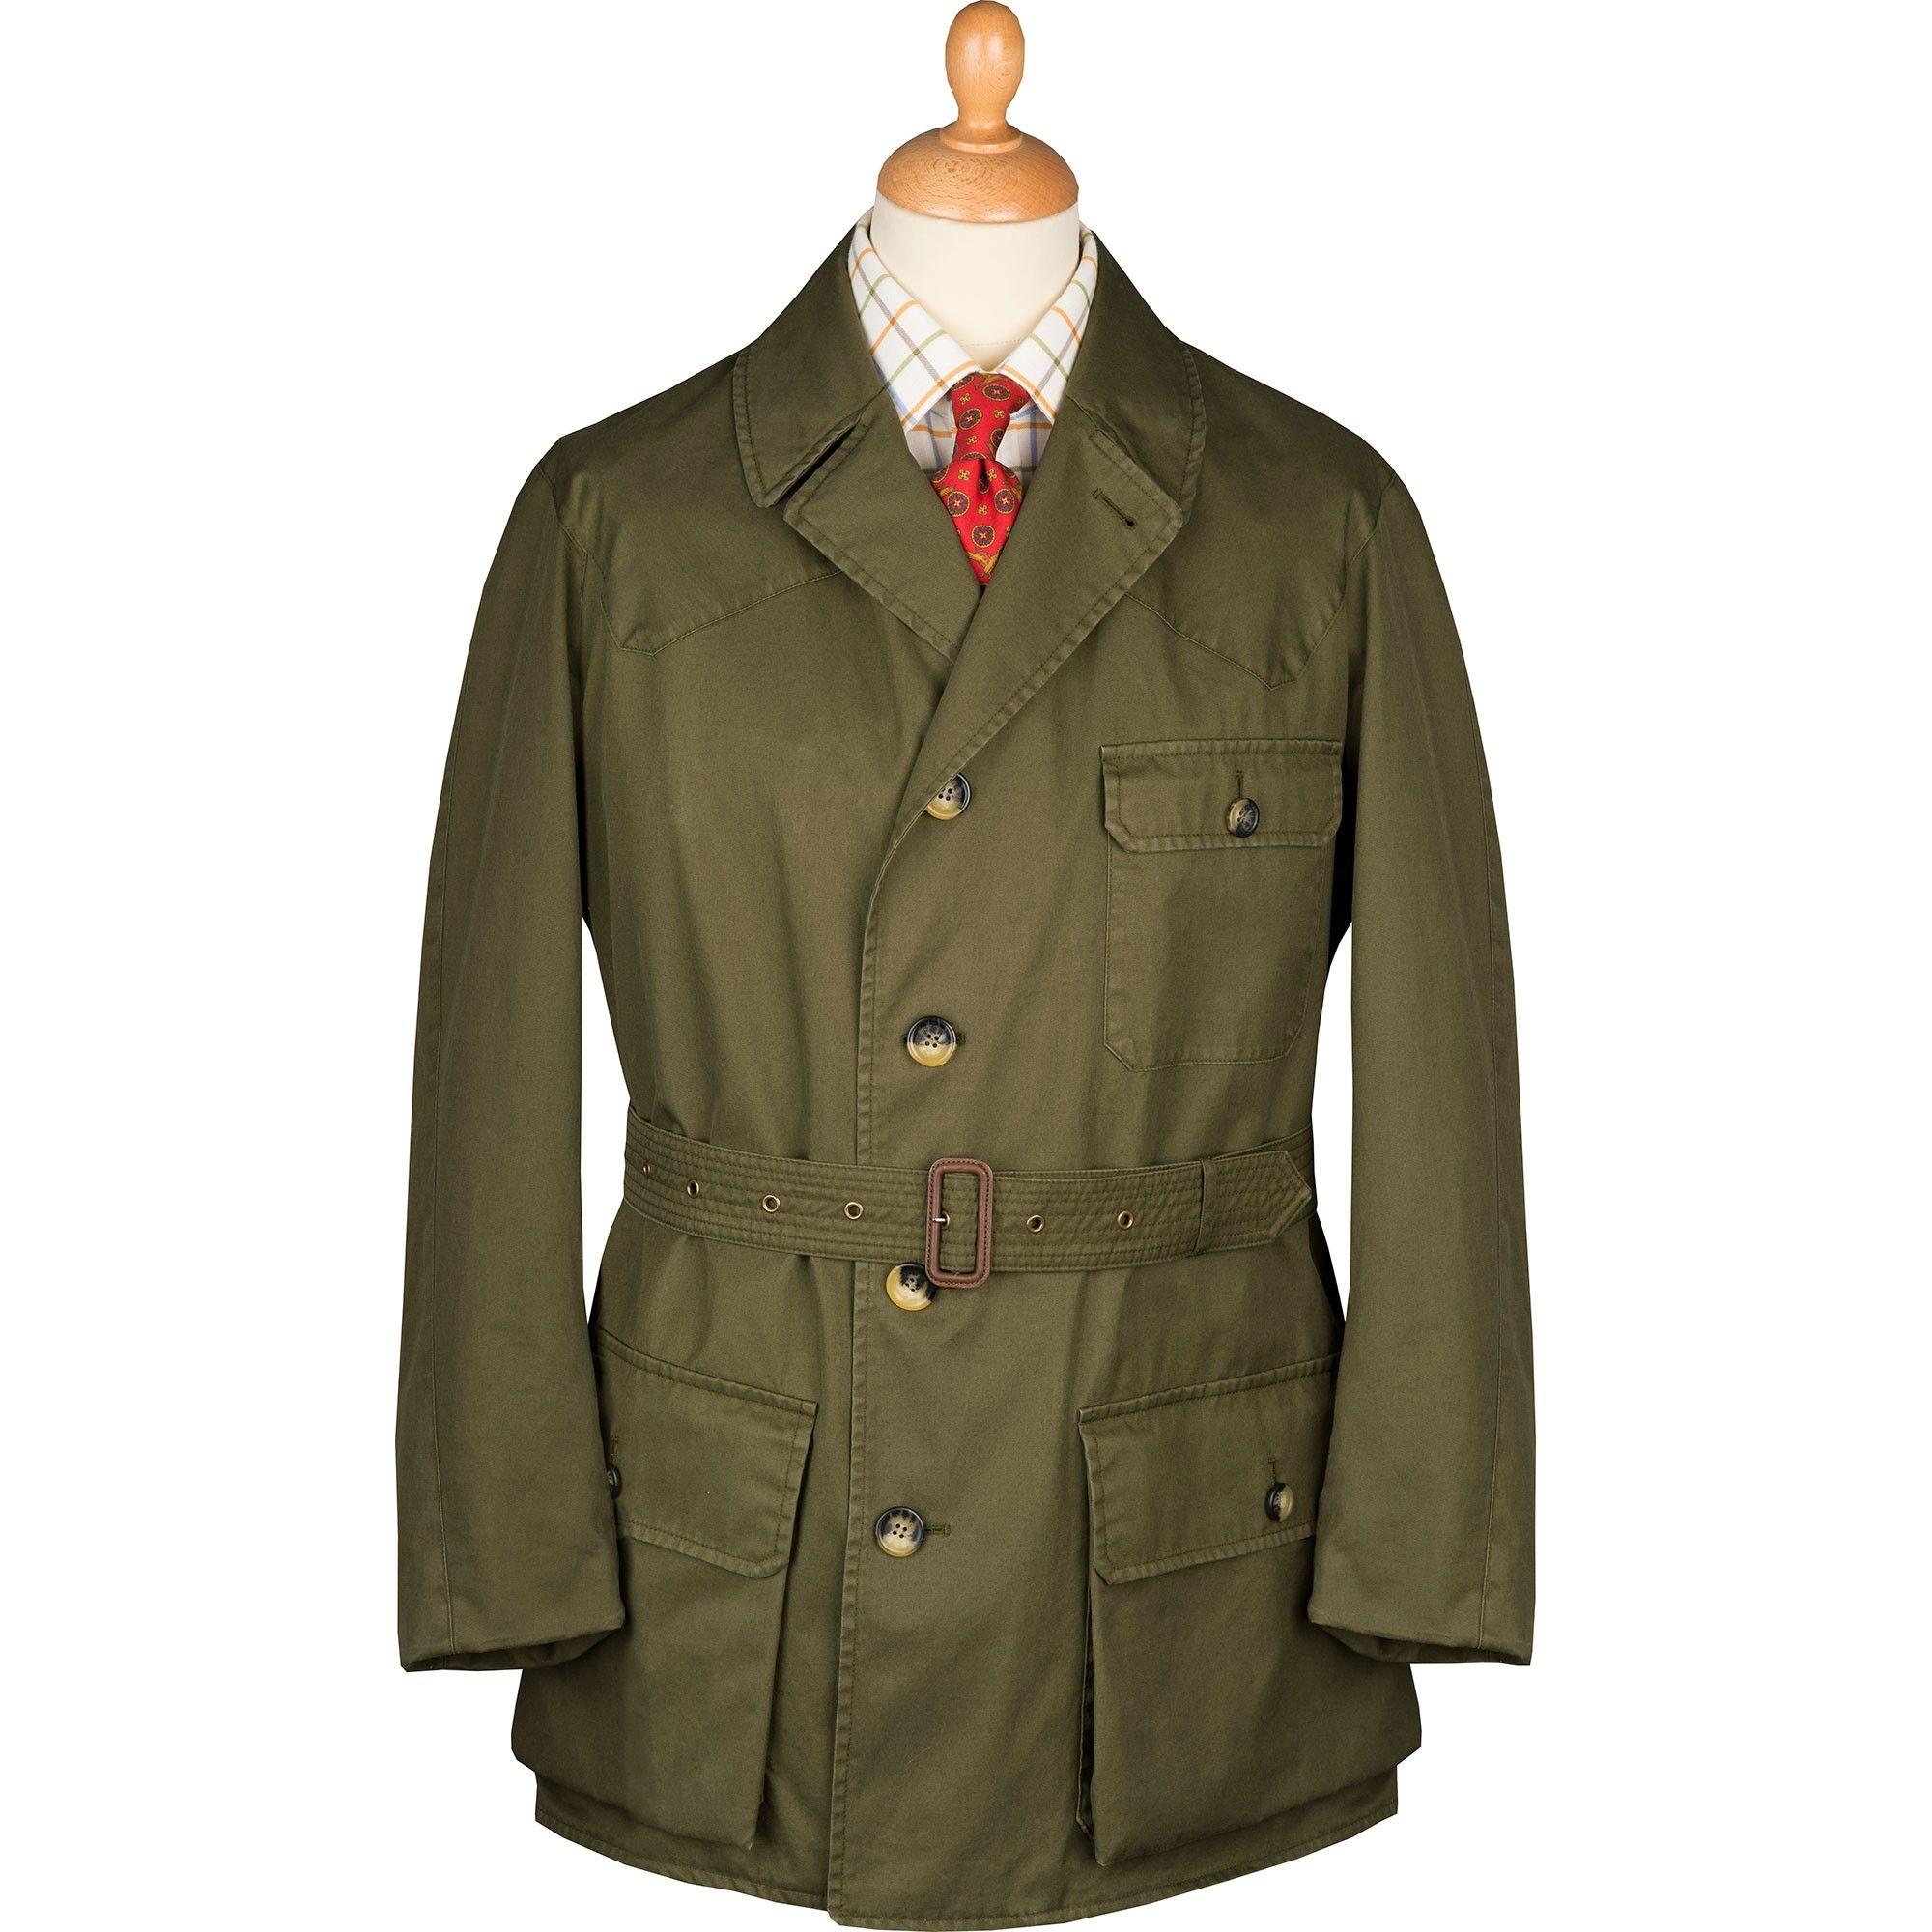 f757c4fa92122 Grenfell Shooting Jacket in 2019 | clothes | Jackets, Coat, Safari ...